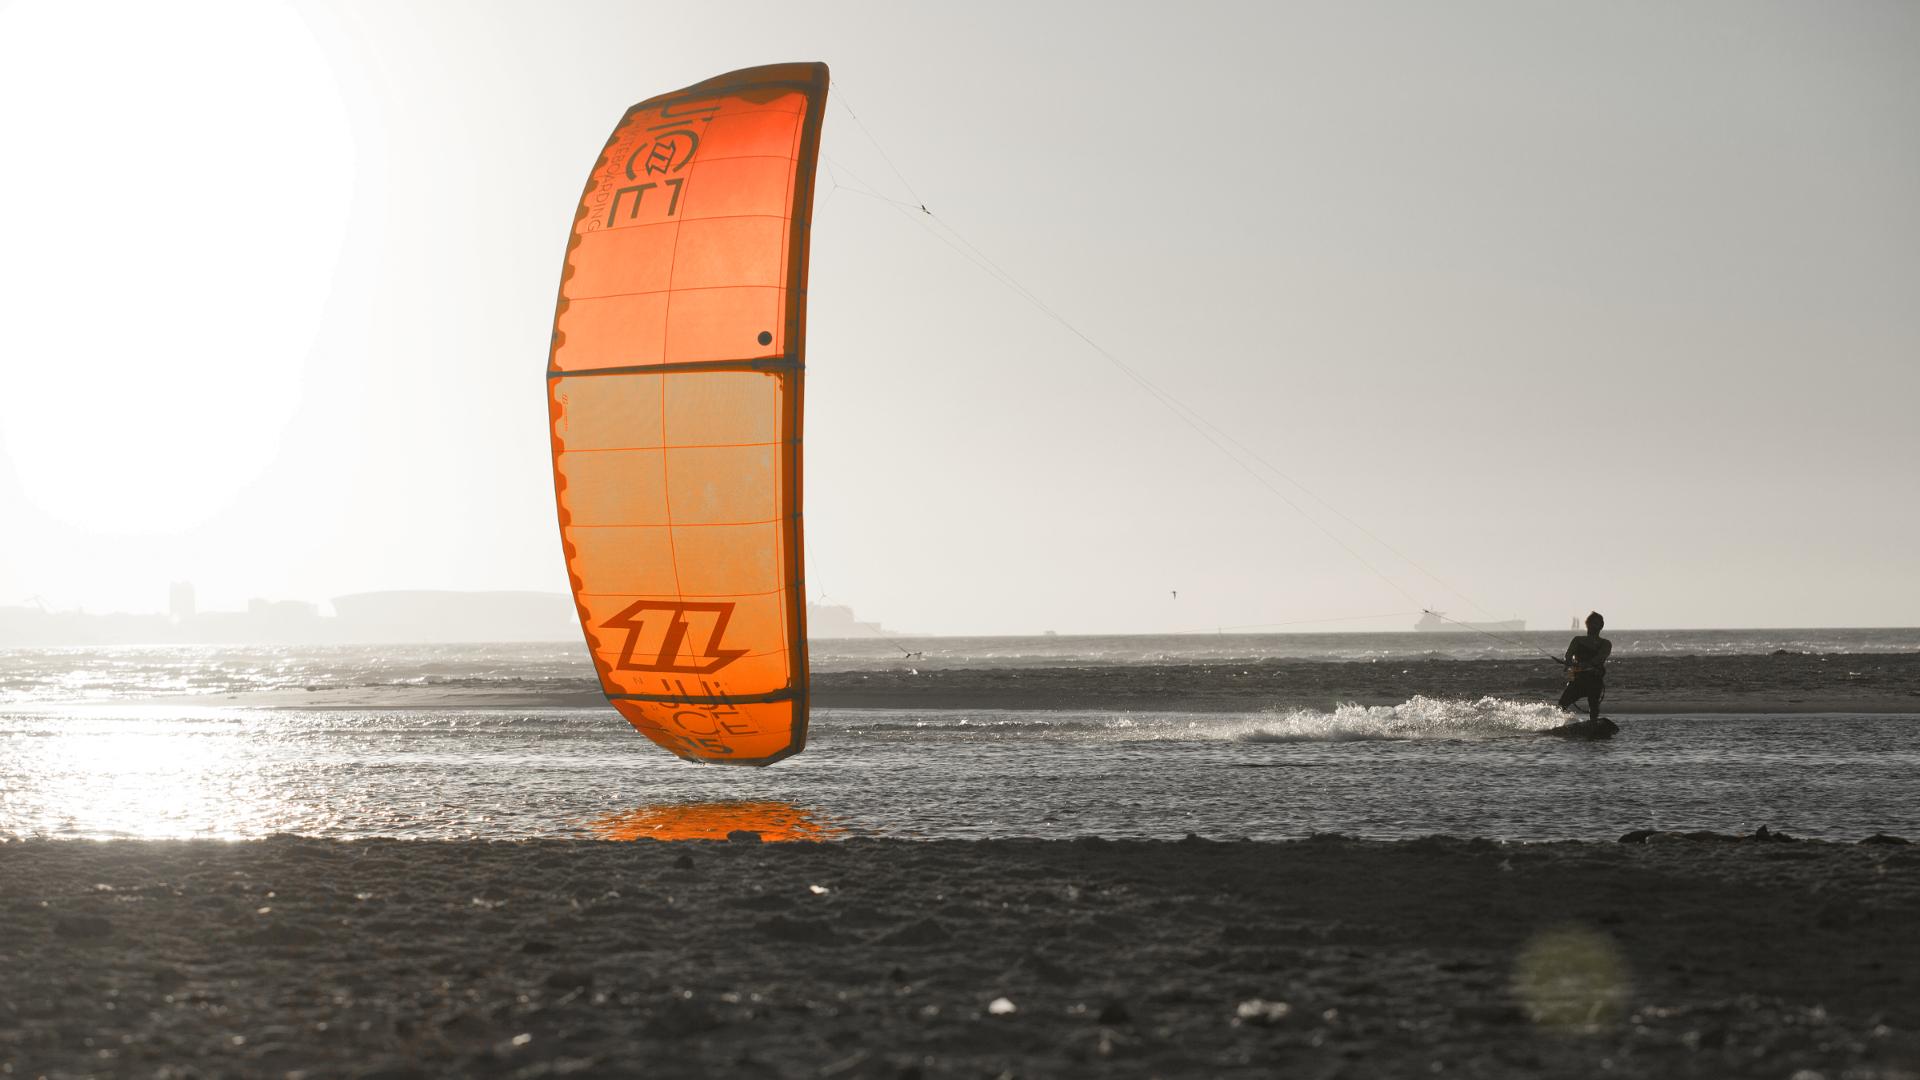 Kitesurf school Boavista - Cape Verde, Learn how to kitesurf with us!